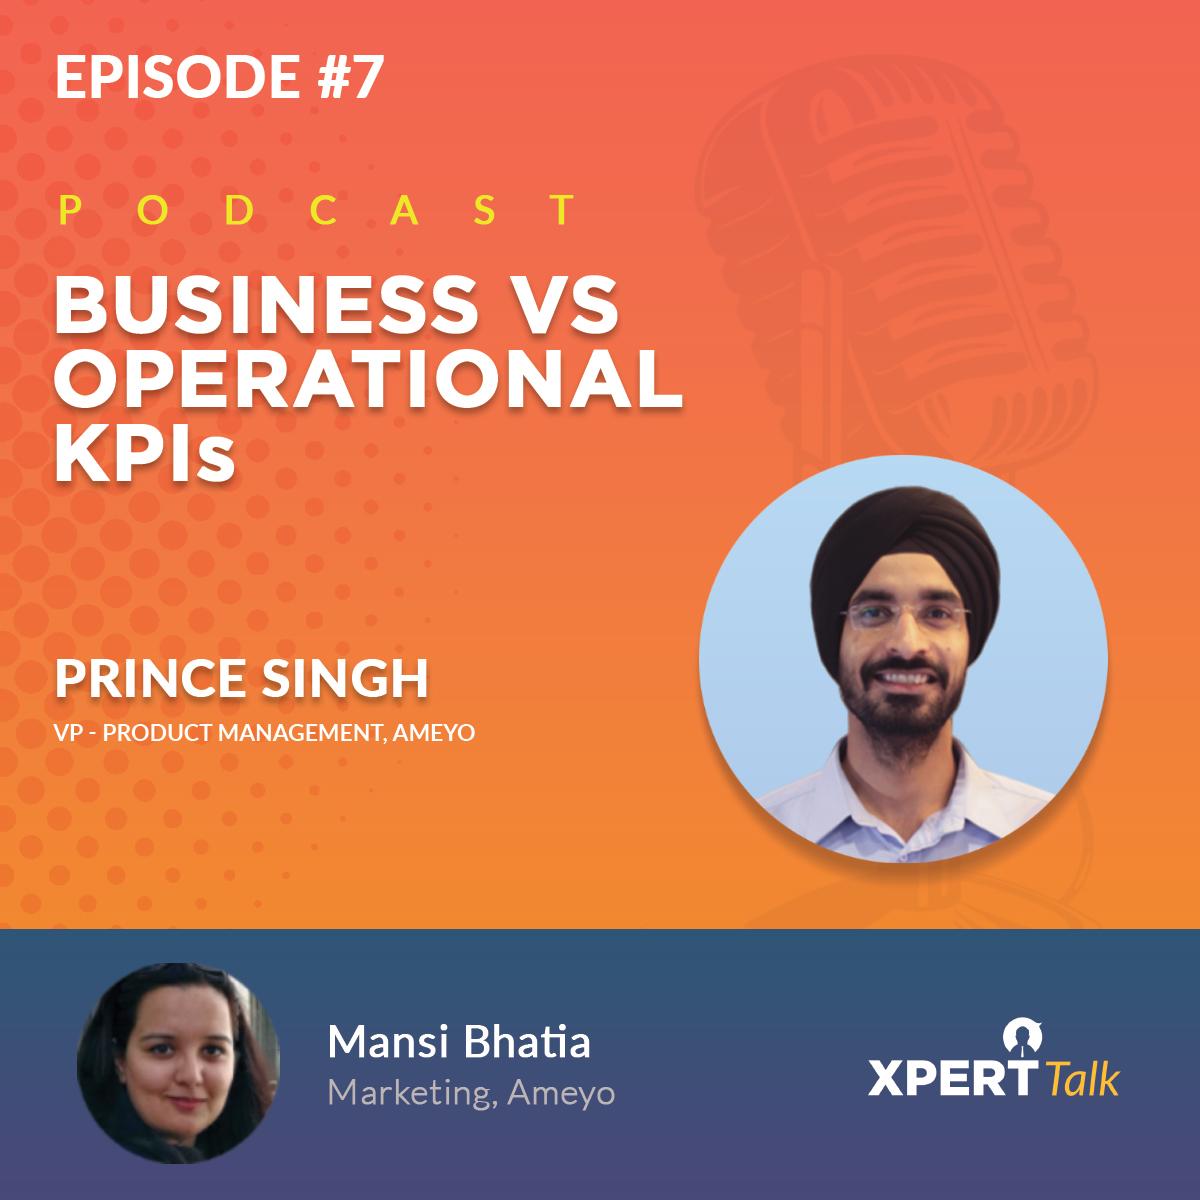 Business Vs Operational KPIs: The True Measure of Success